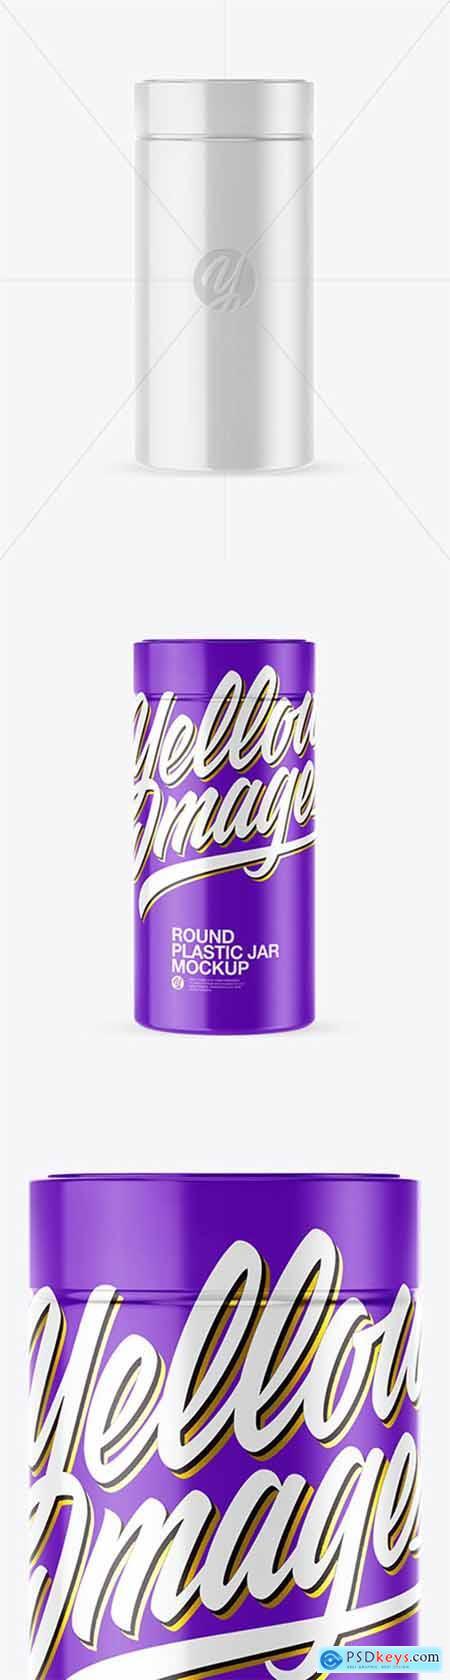 Jar in Glossy Shrink Sleeve Mockup 51857